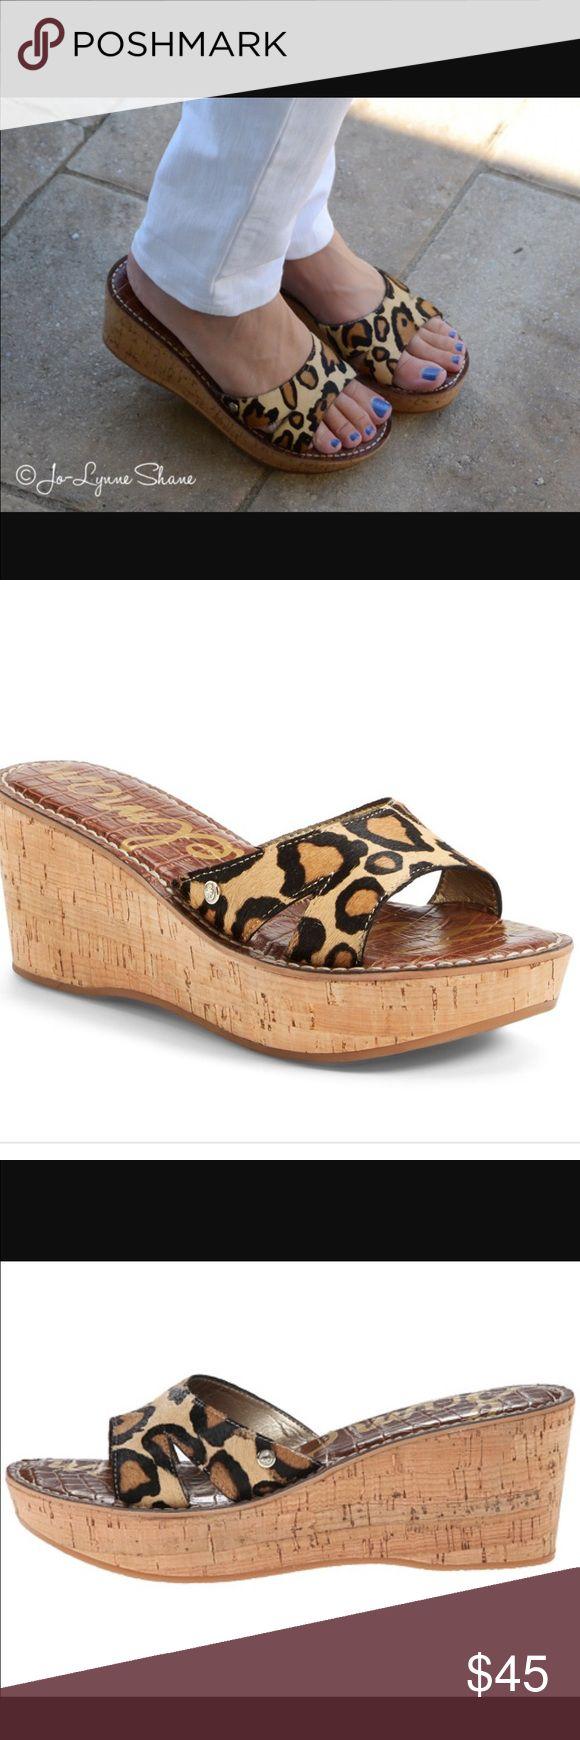 Sam Edelman Reid Leopard Sandal Never worn trendy Sam Edelman Leopard sandals Sam Edelman Shoes Sandals